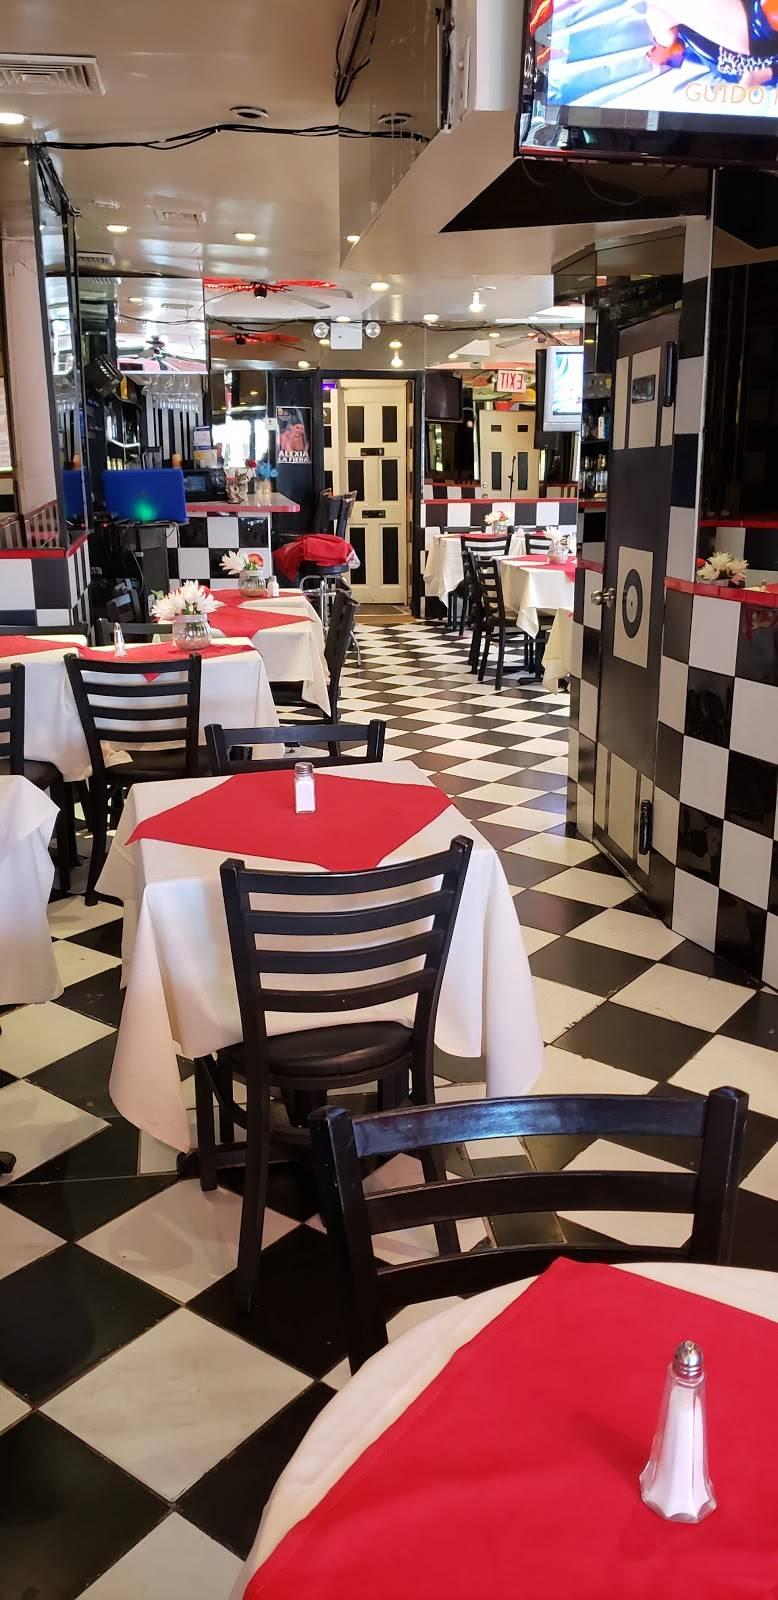 Vinicios | restaurant | 40-21 108th St, Flushing, NY 11368, USA | 7184783600 OR +1 718-478-3600